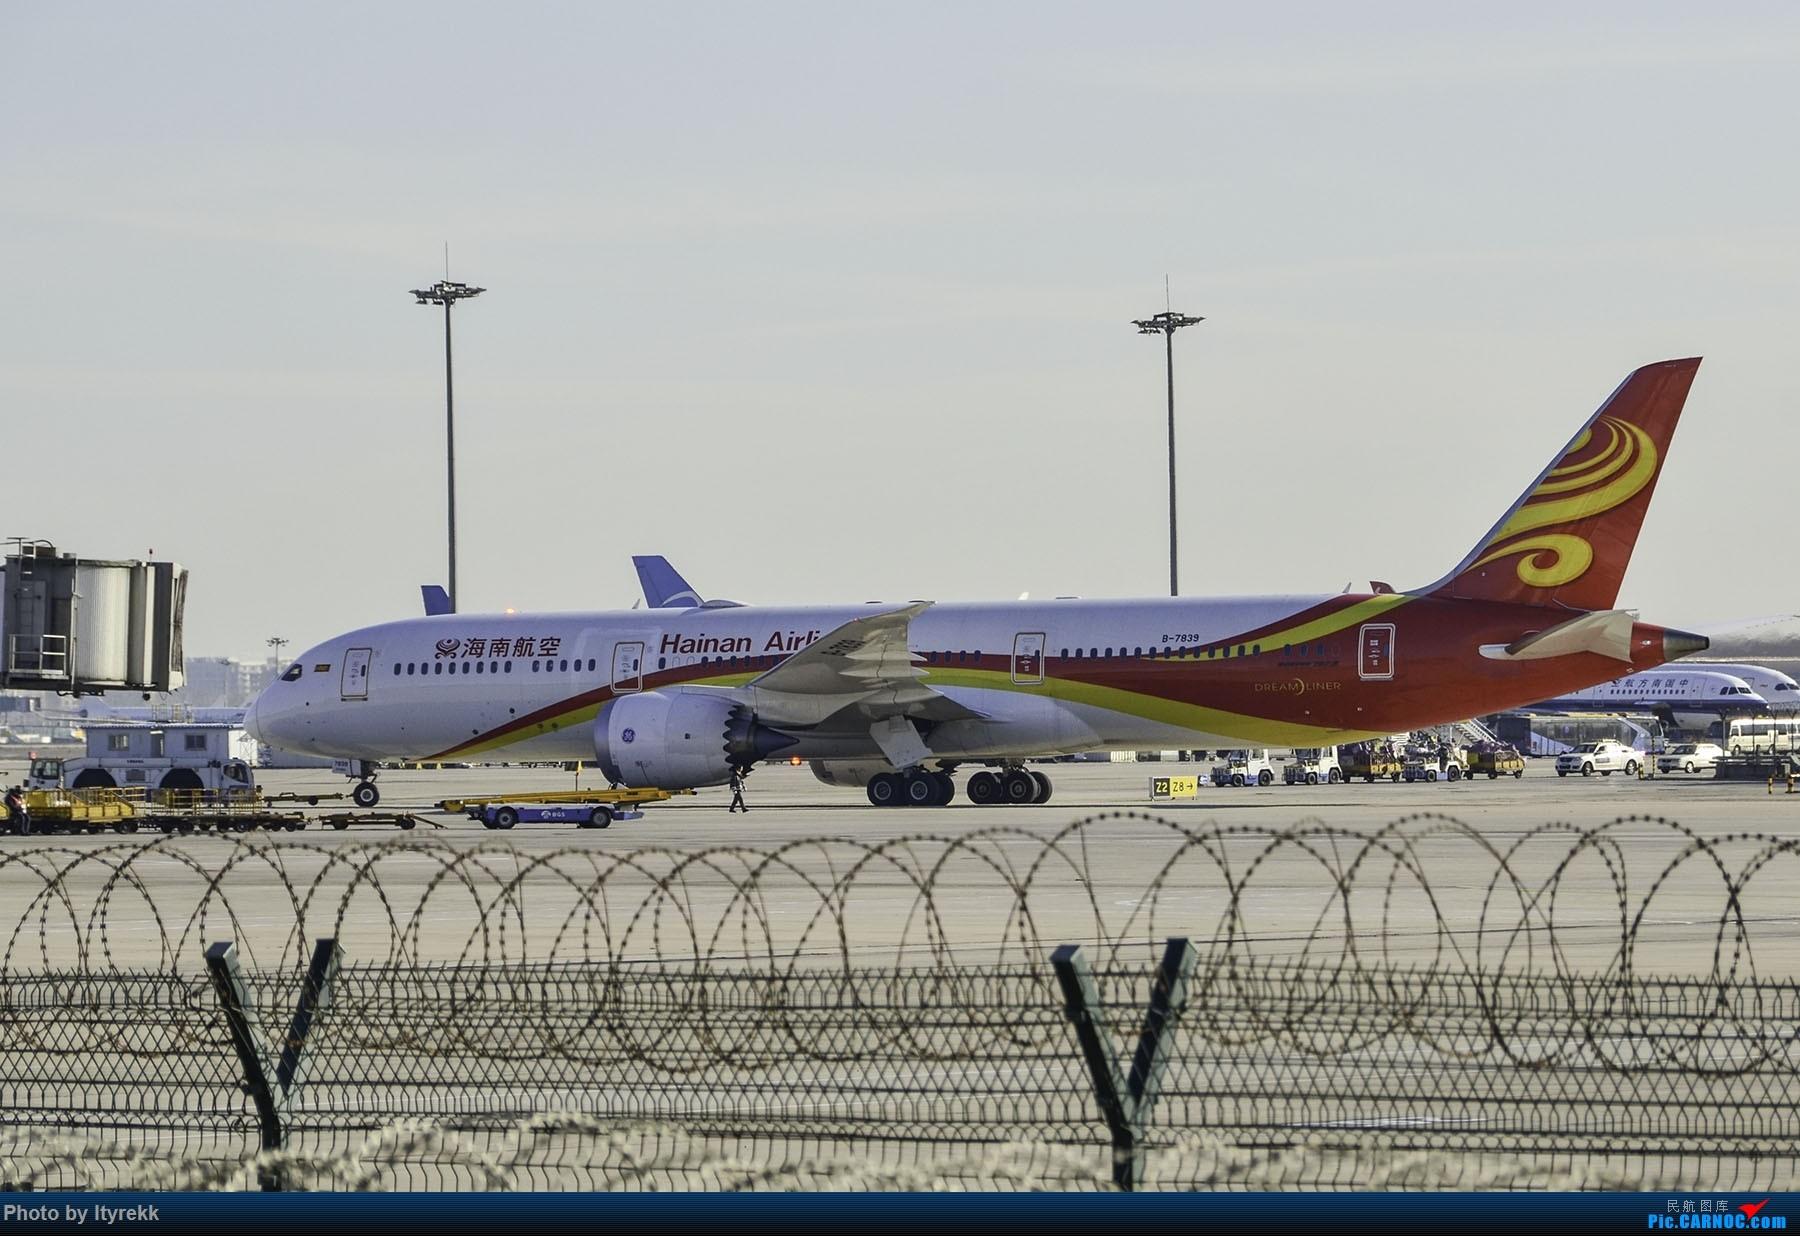 Re:[原创]PEK一日游 收获厦航首架789 B-1566等 BOEING 787-9 B-7839 中国北京首都国际机场